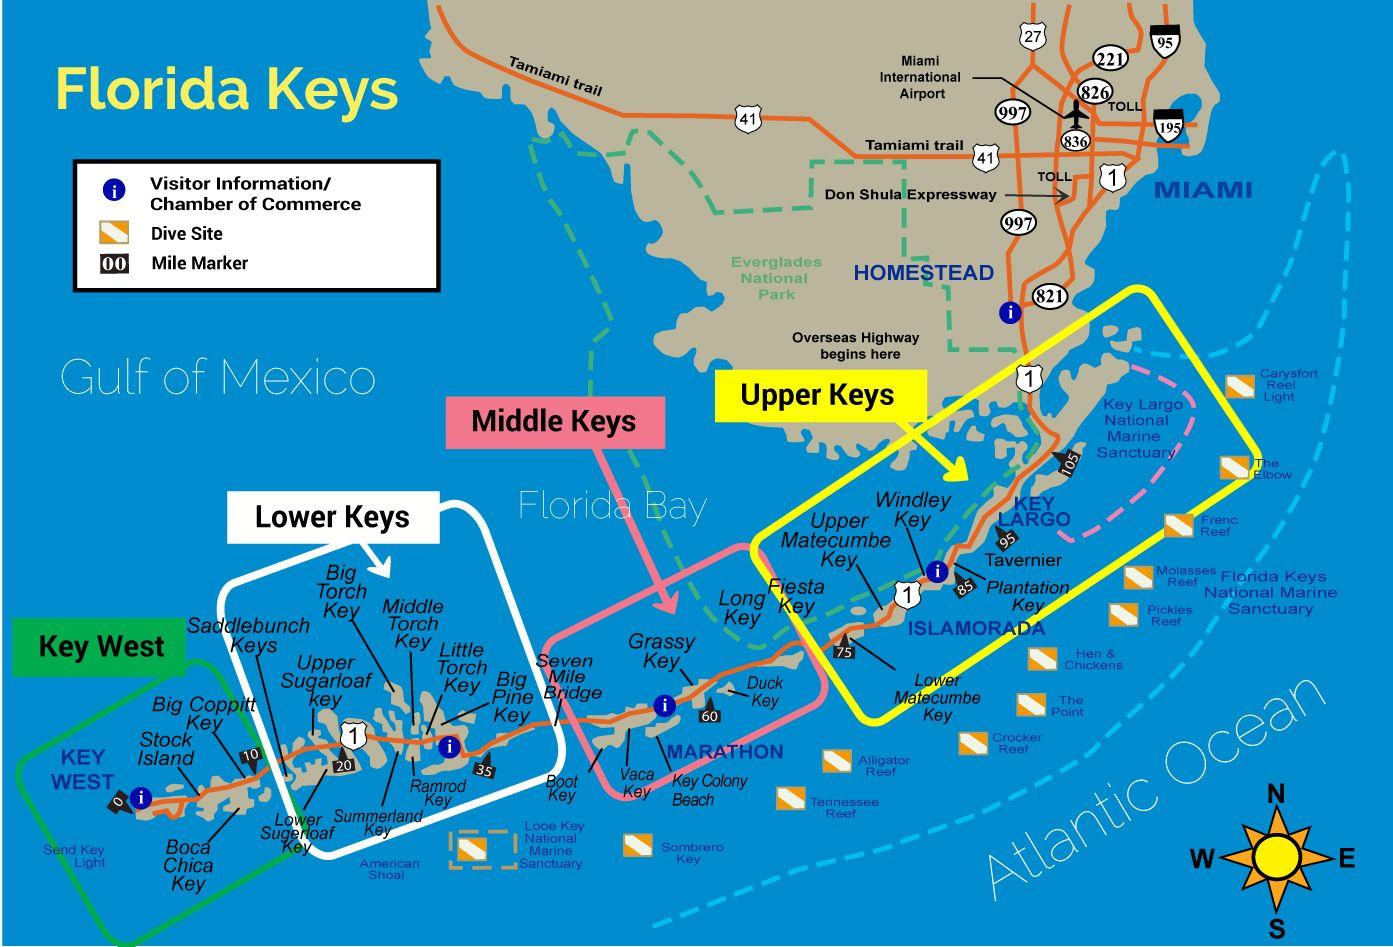 Map Of Areas Servedflorida Keys Vacation Rentals | Vacation - Florida Keys Dive Map